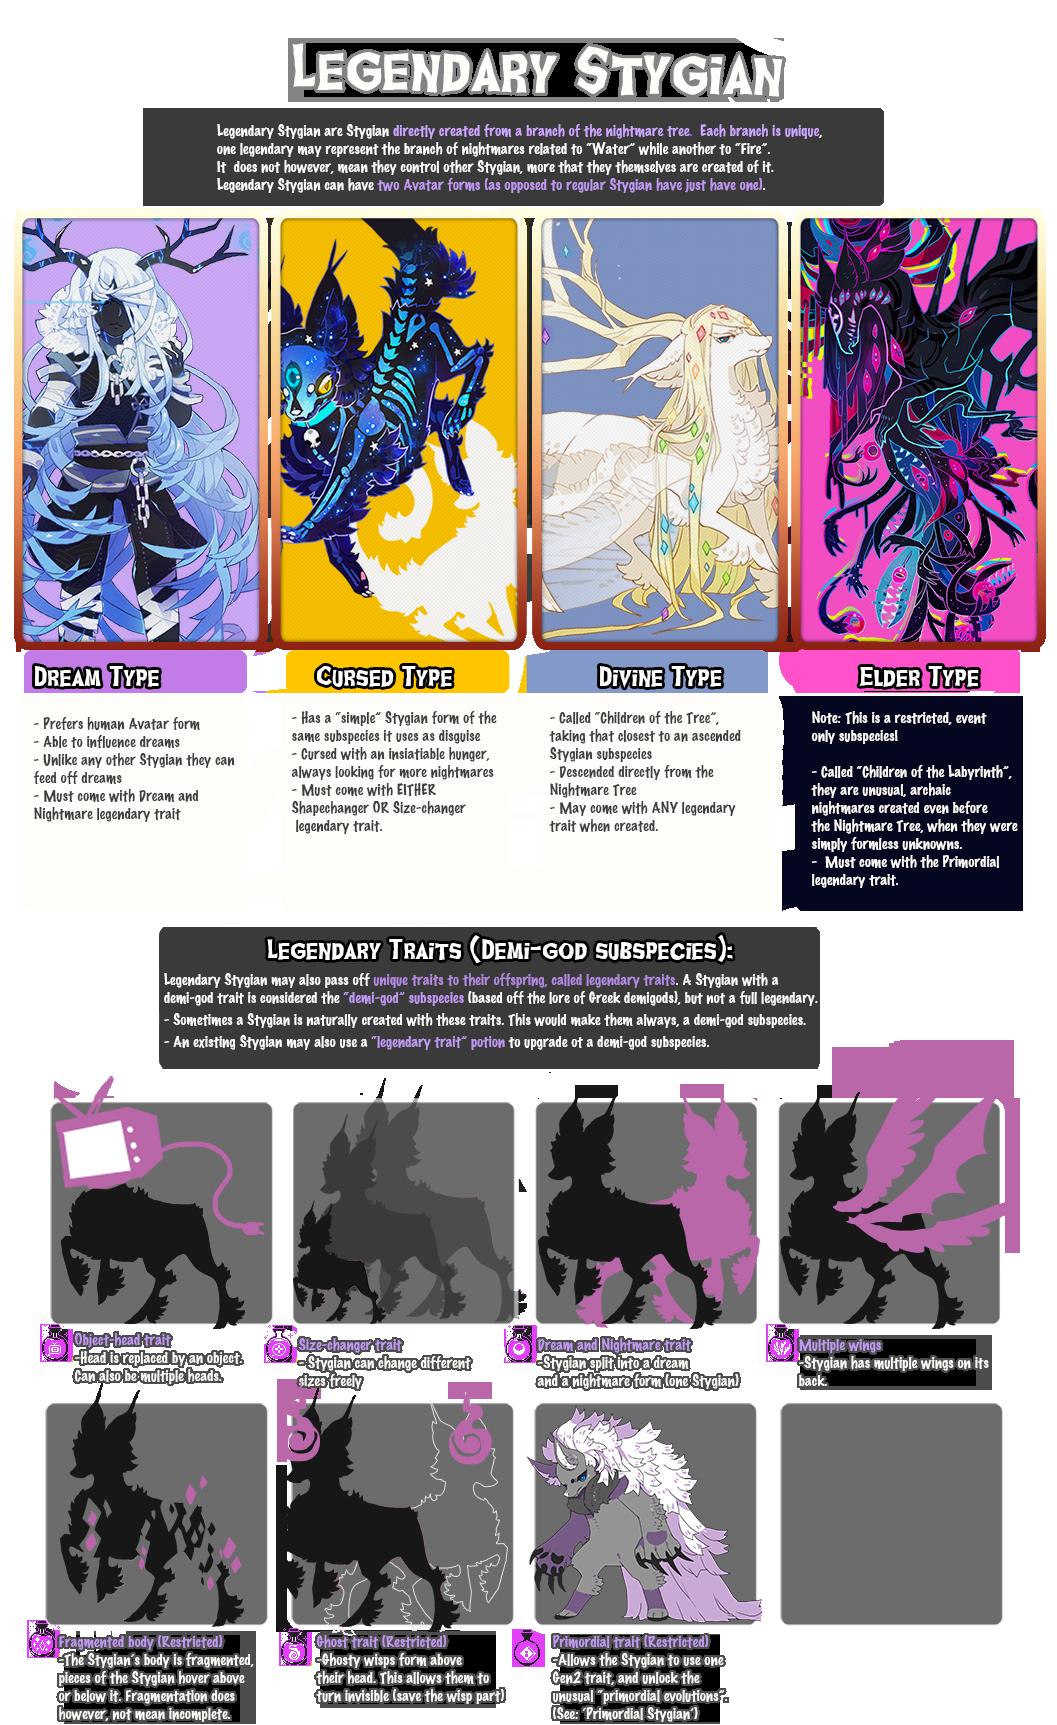 { STYGIAN } Legendary Stygian /Traits + NEW!